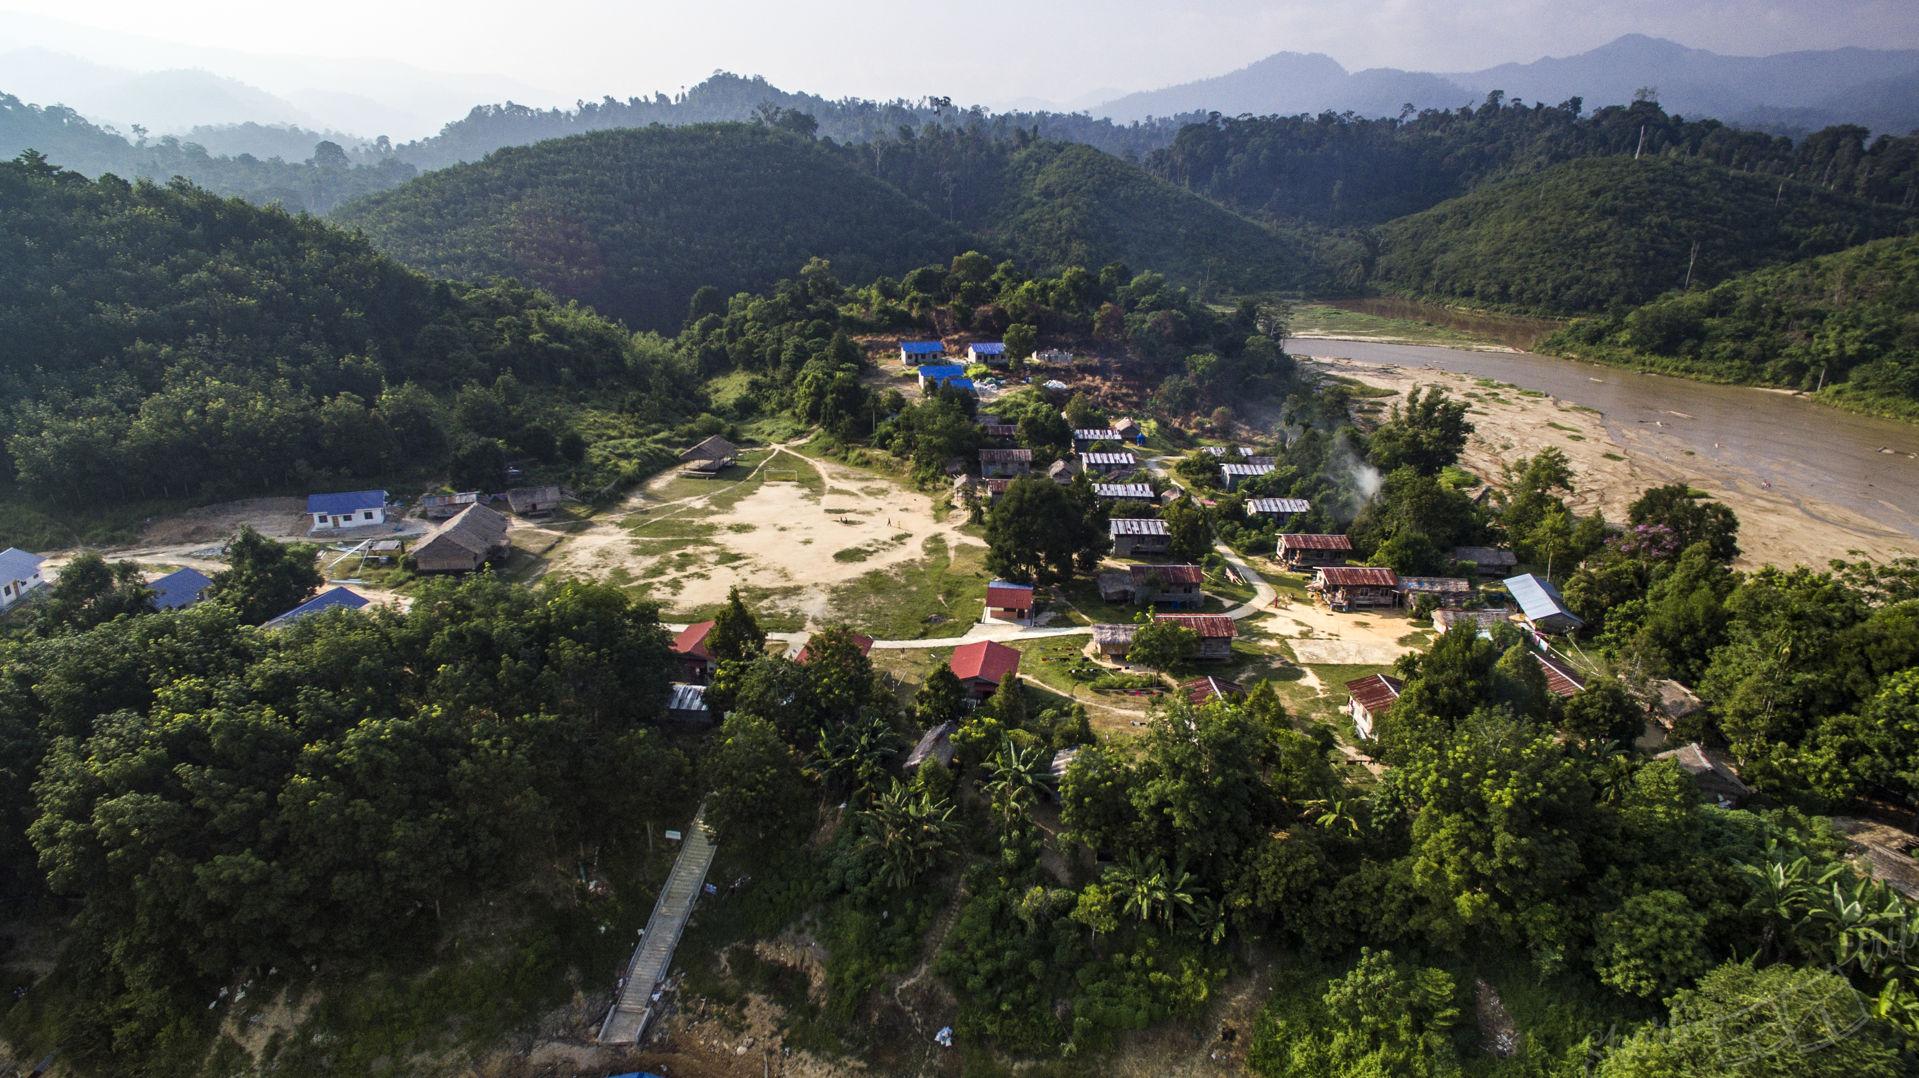 asli village, asli malaysia, asli drone, aborigine people house, aborigine house drone malaysia